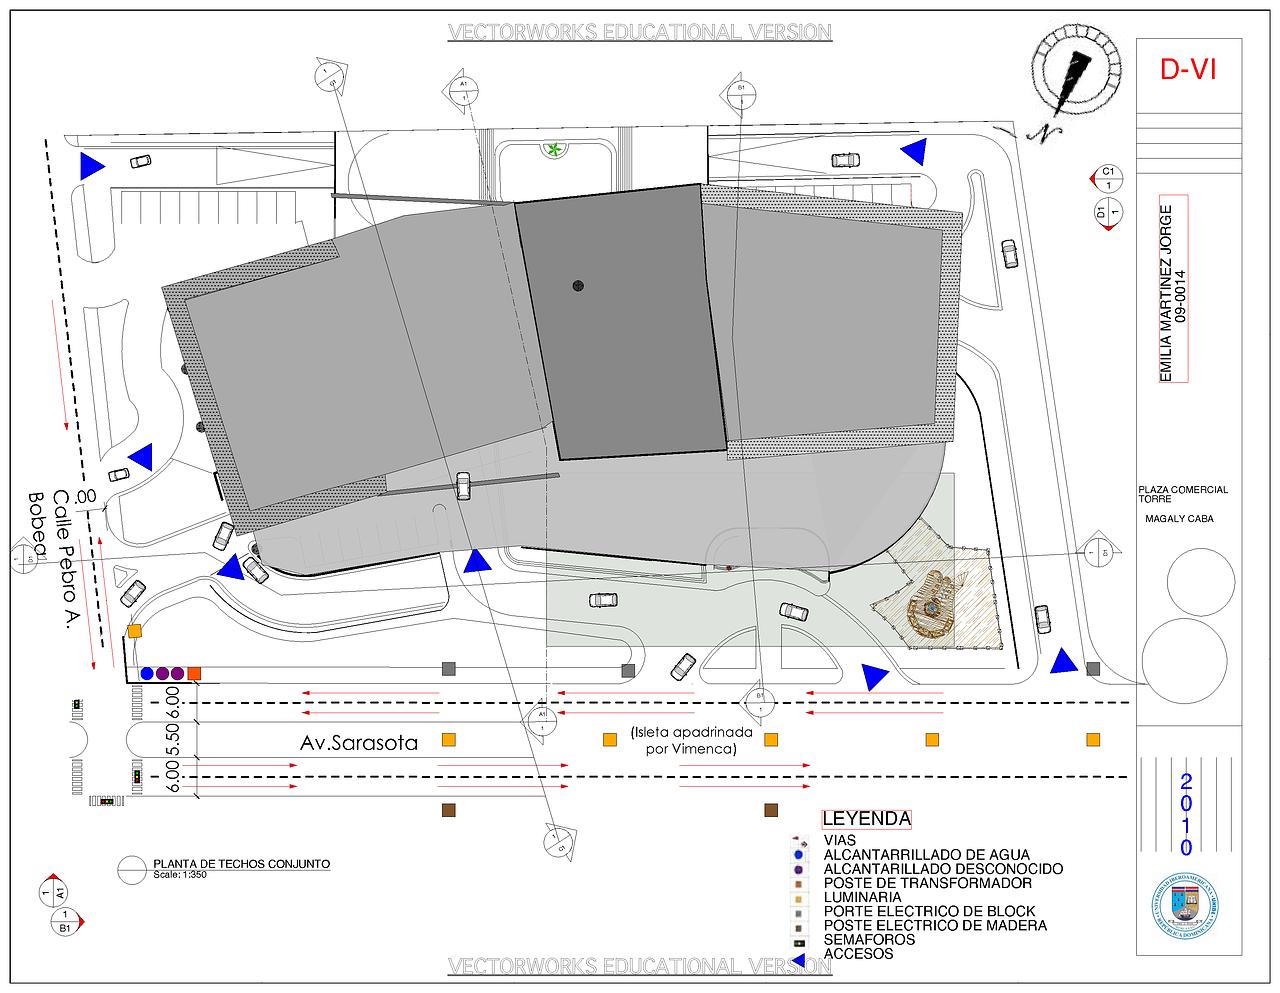 Wix Com Dibujo Arquitectonico Created By Valerie1324 Based On  # Muebles Dibujo Arquitectonico